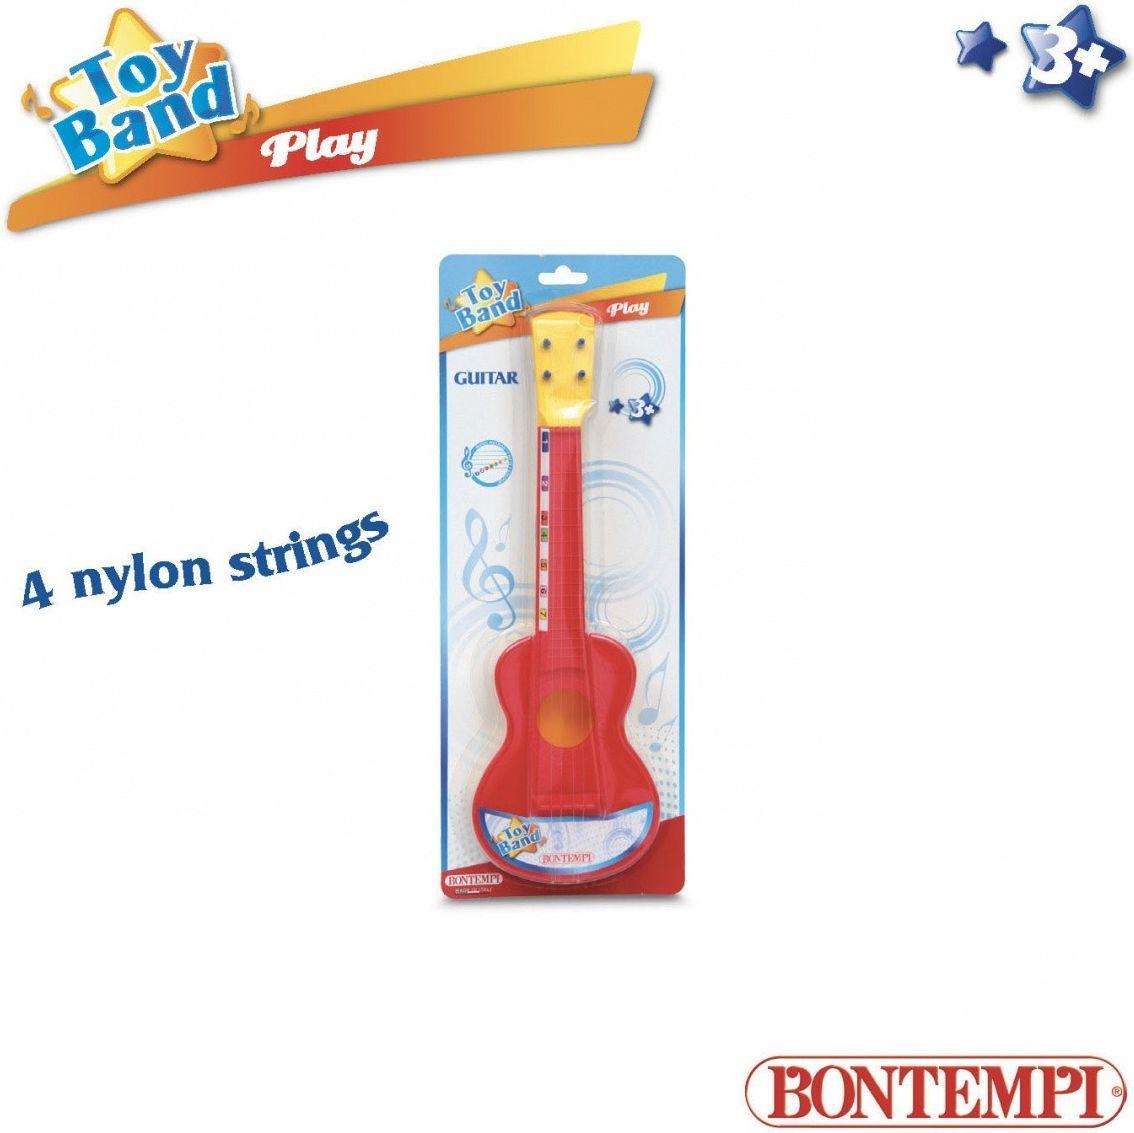 Bontempi Gitara hiszpanska 4-strunowa, 40 cm (041-12066) GXP-649603